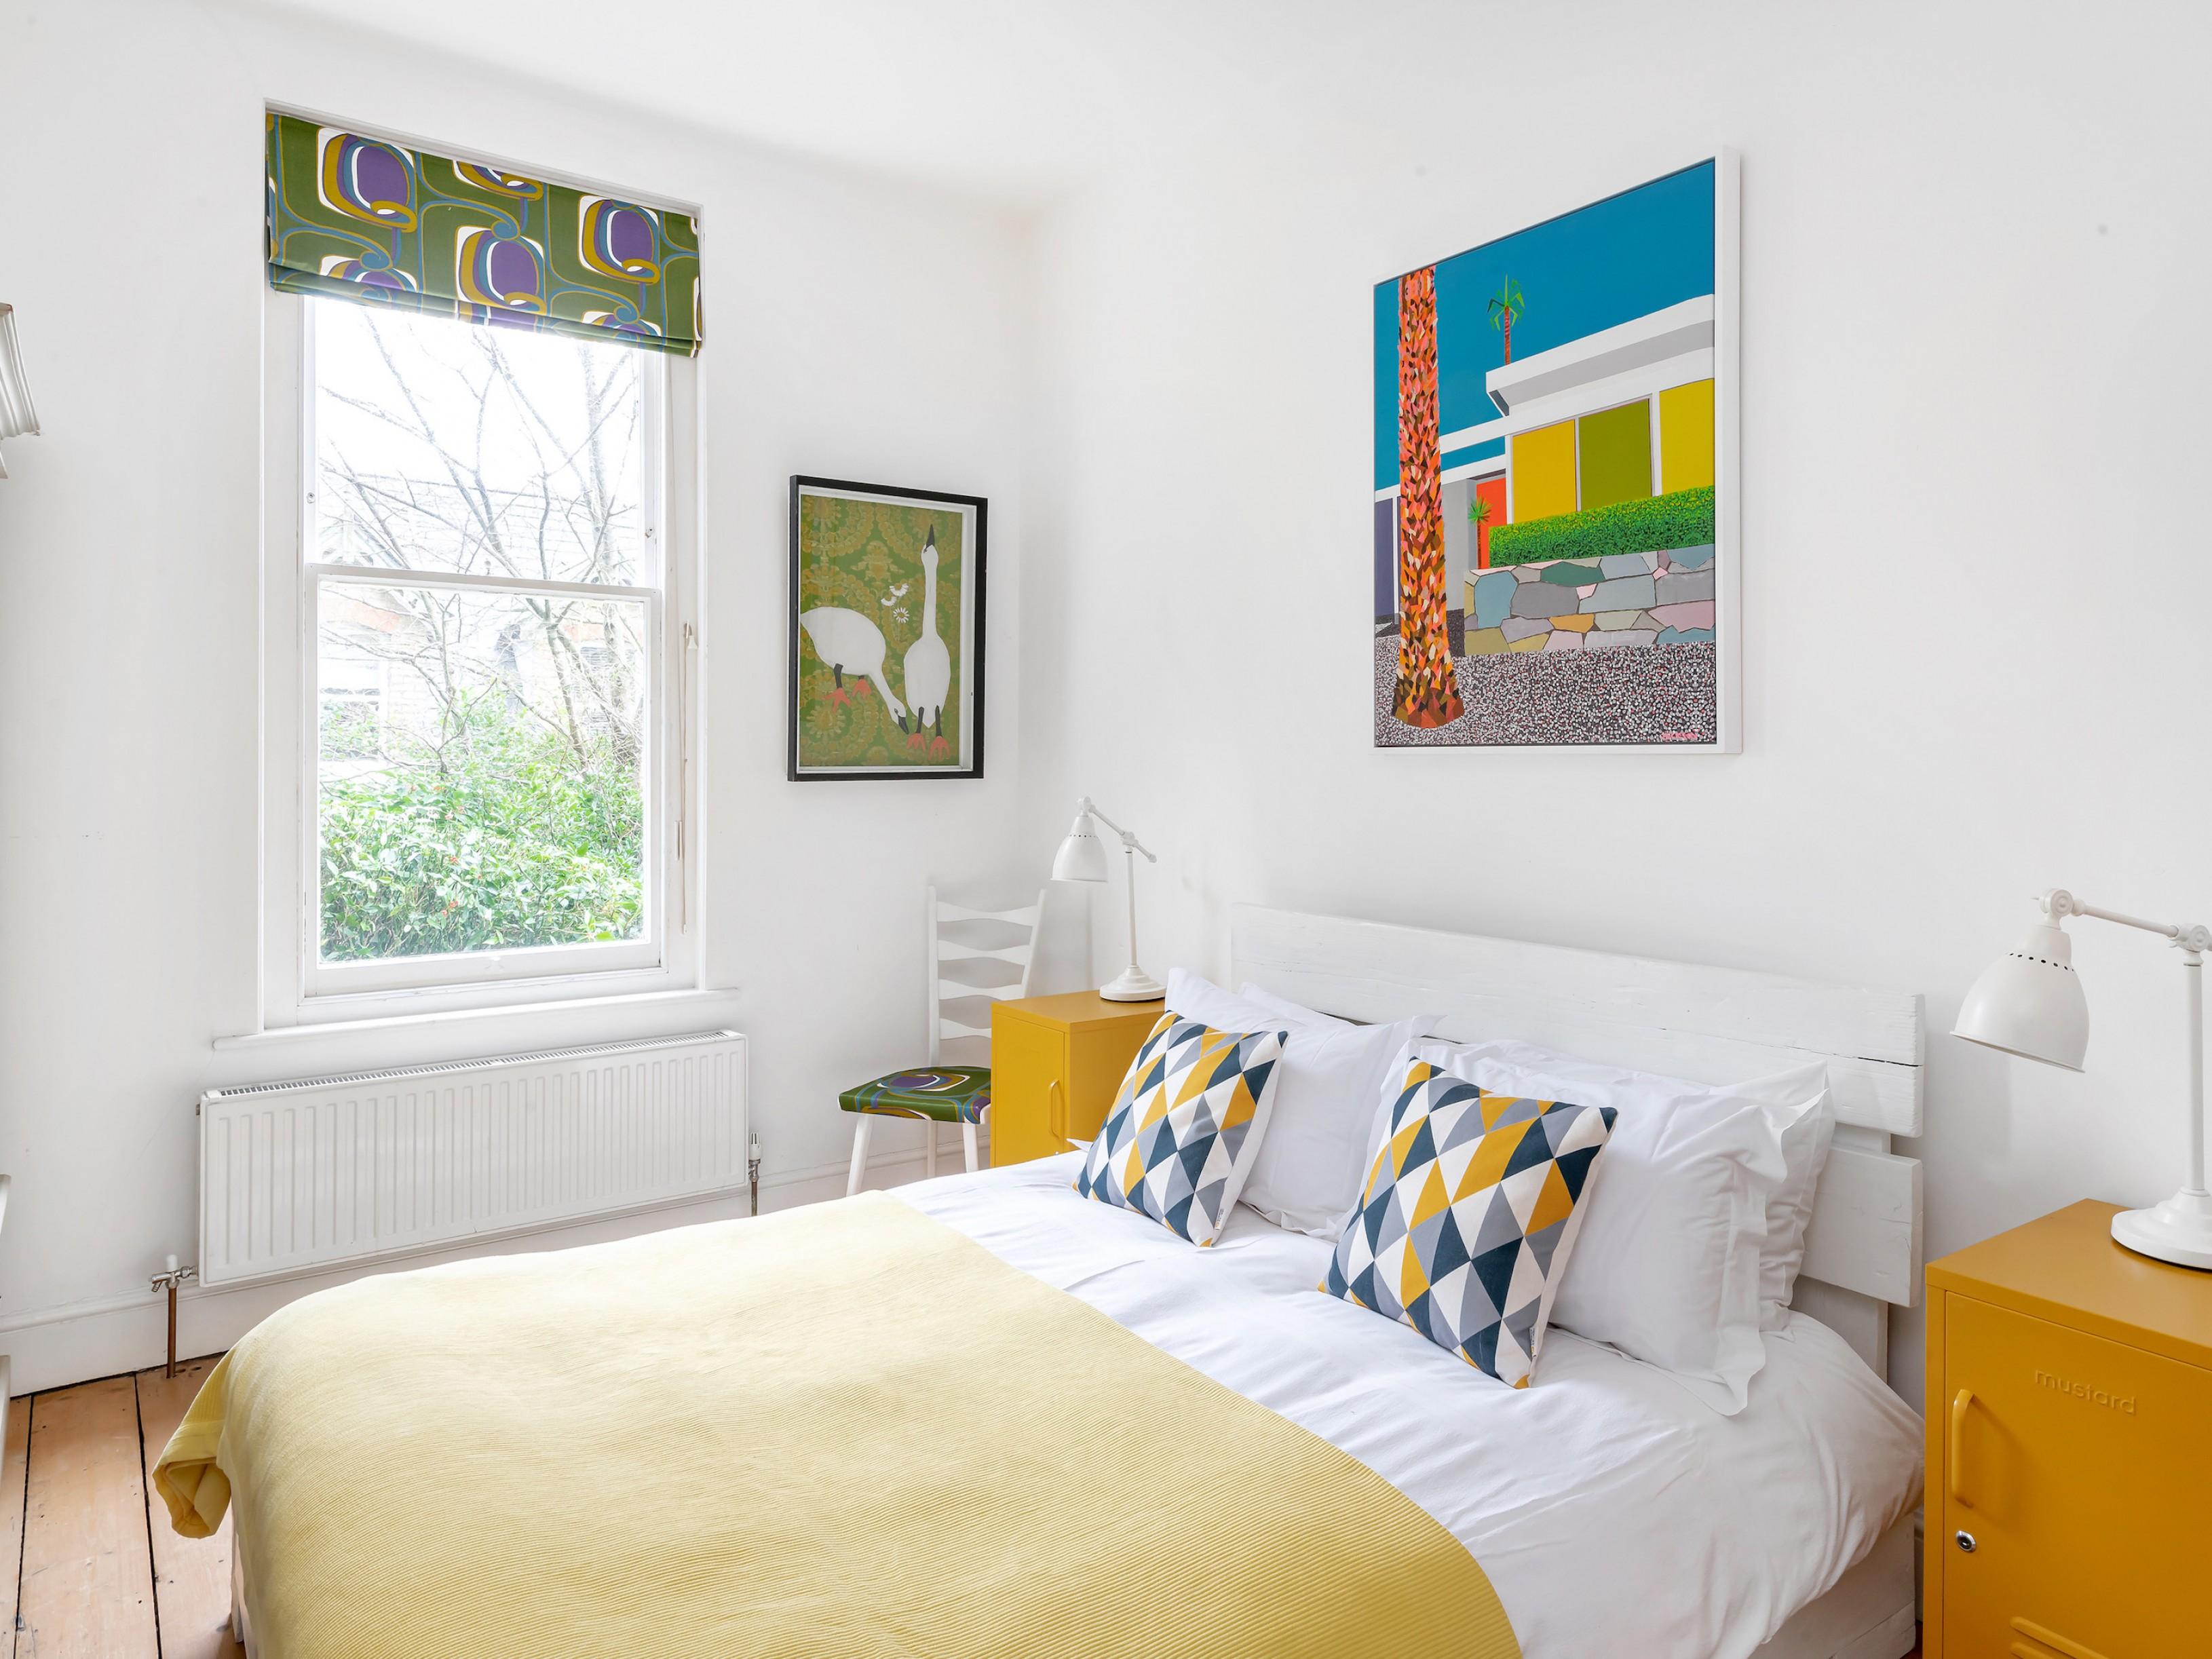 Bedroom 4, KS bed